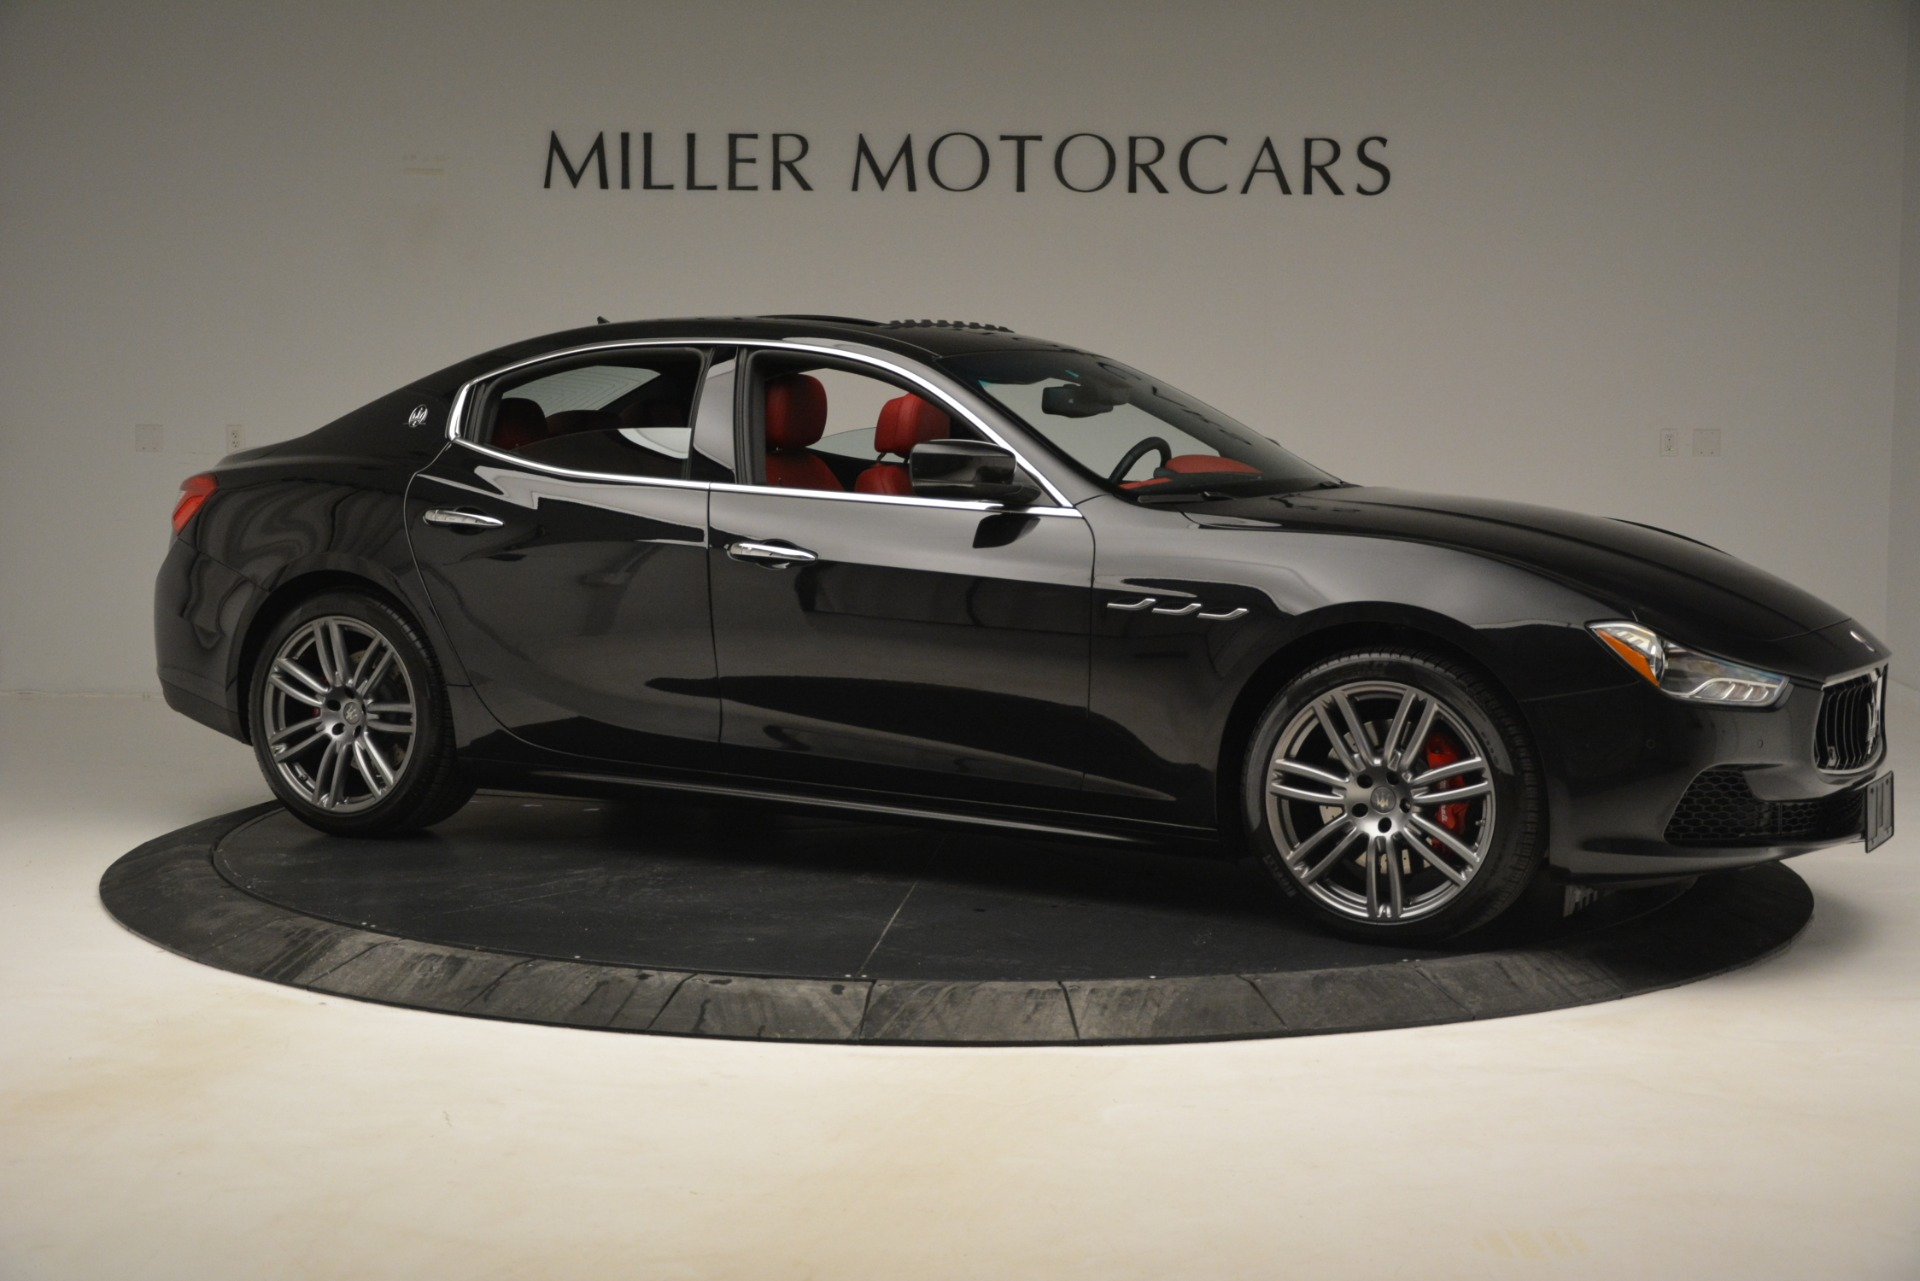 Used 2016 Maserati Ghibli S Q4 For Sale In Greenwich, CT 2945_p12